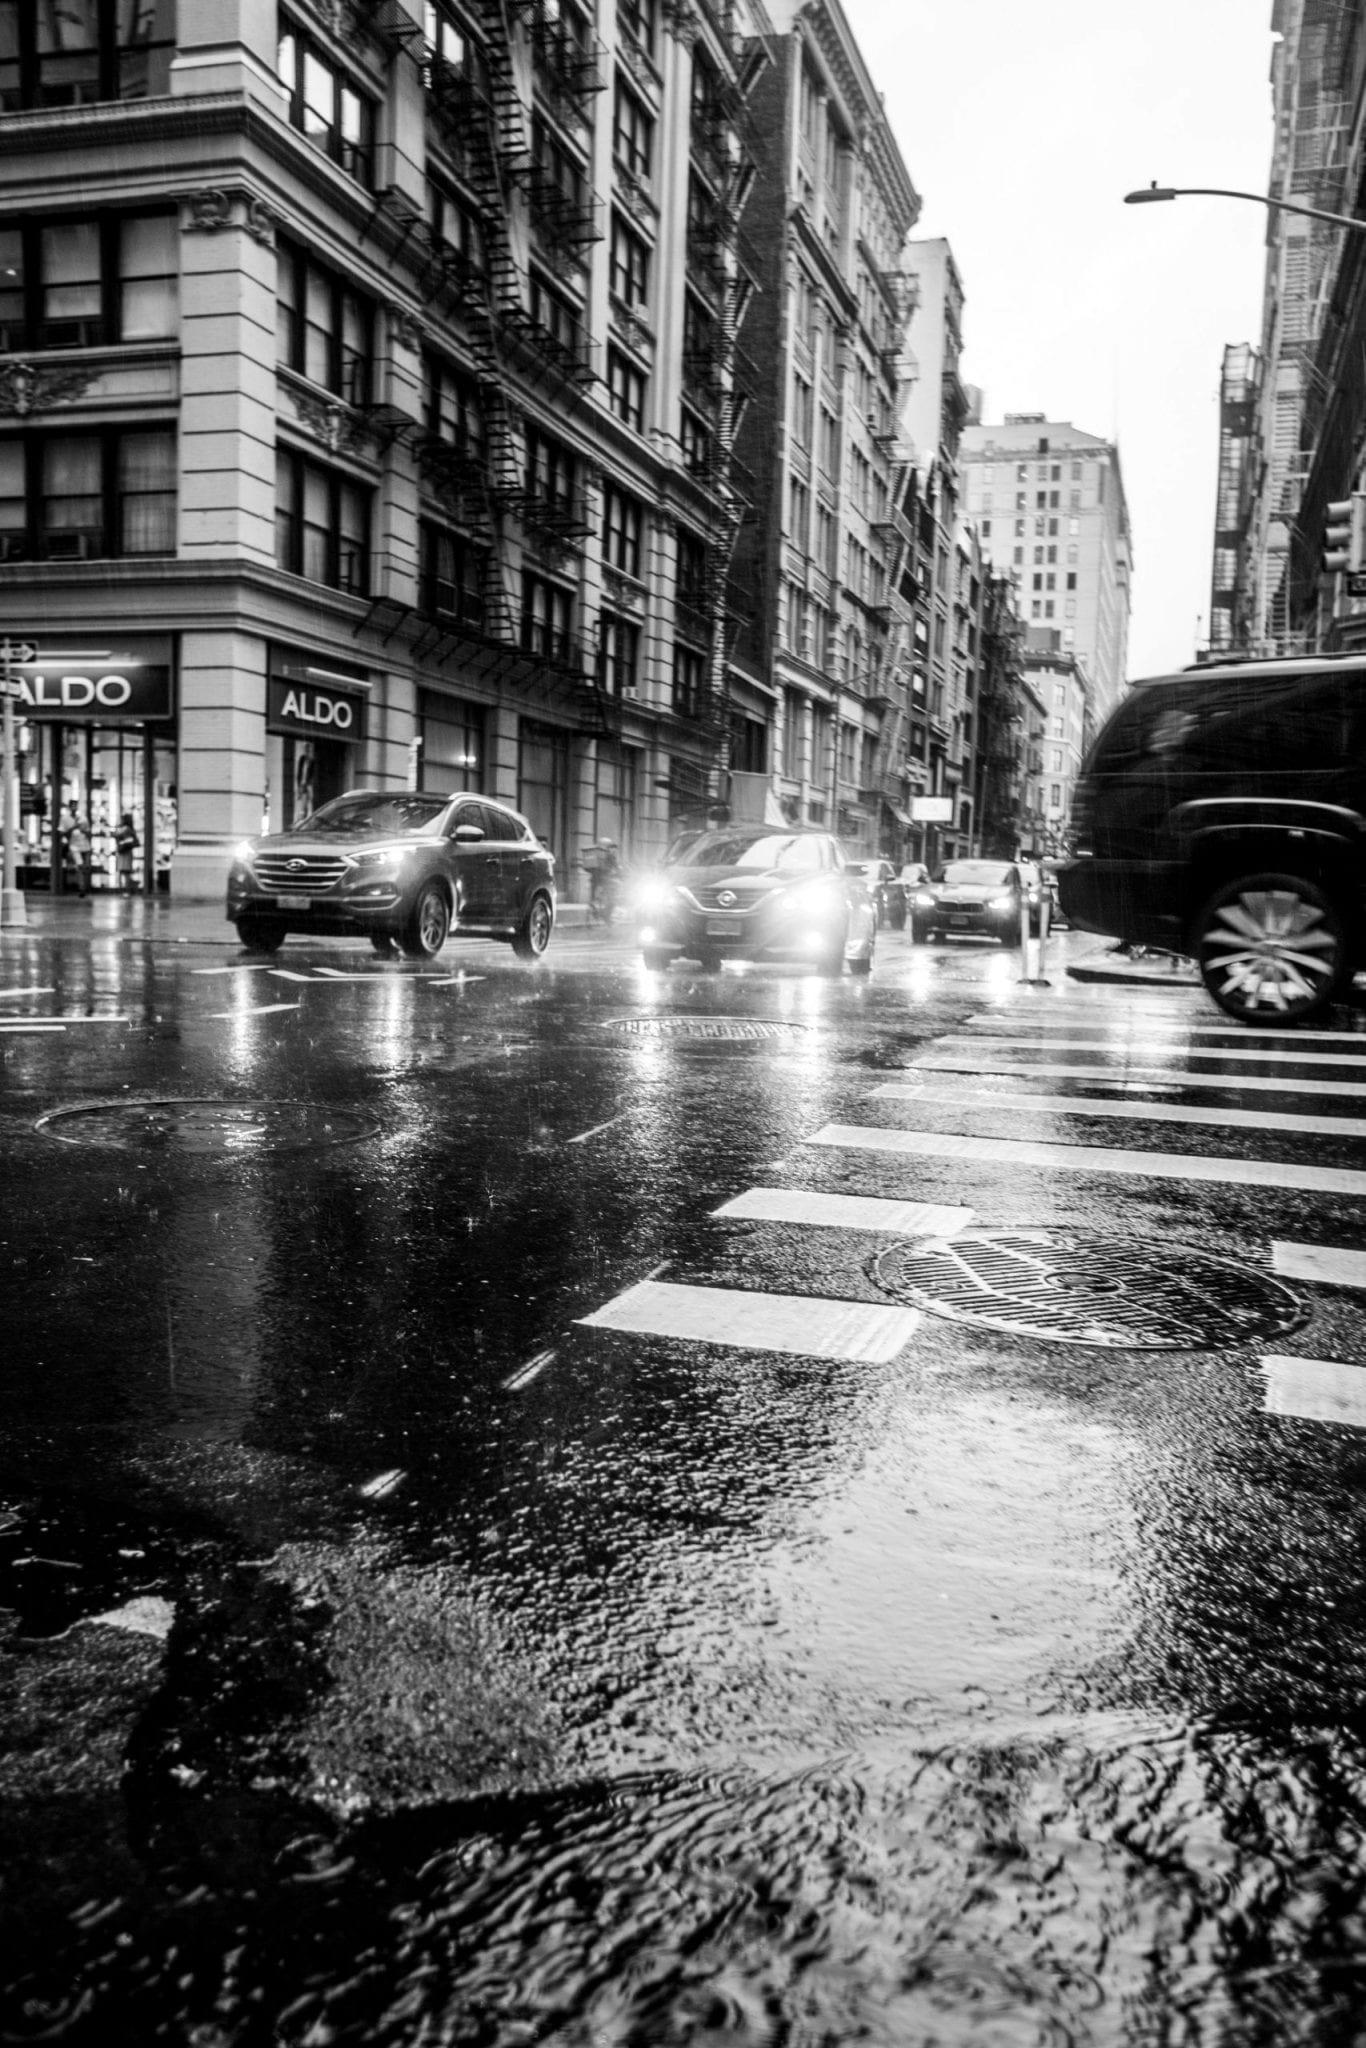 rue New York, photo et reportage de voyage Studio End